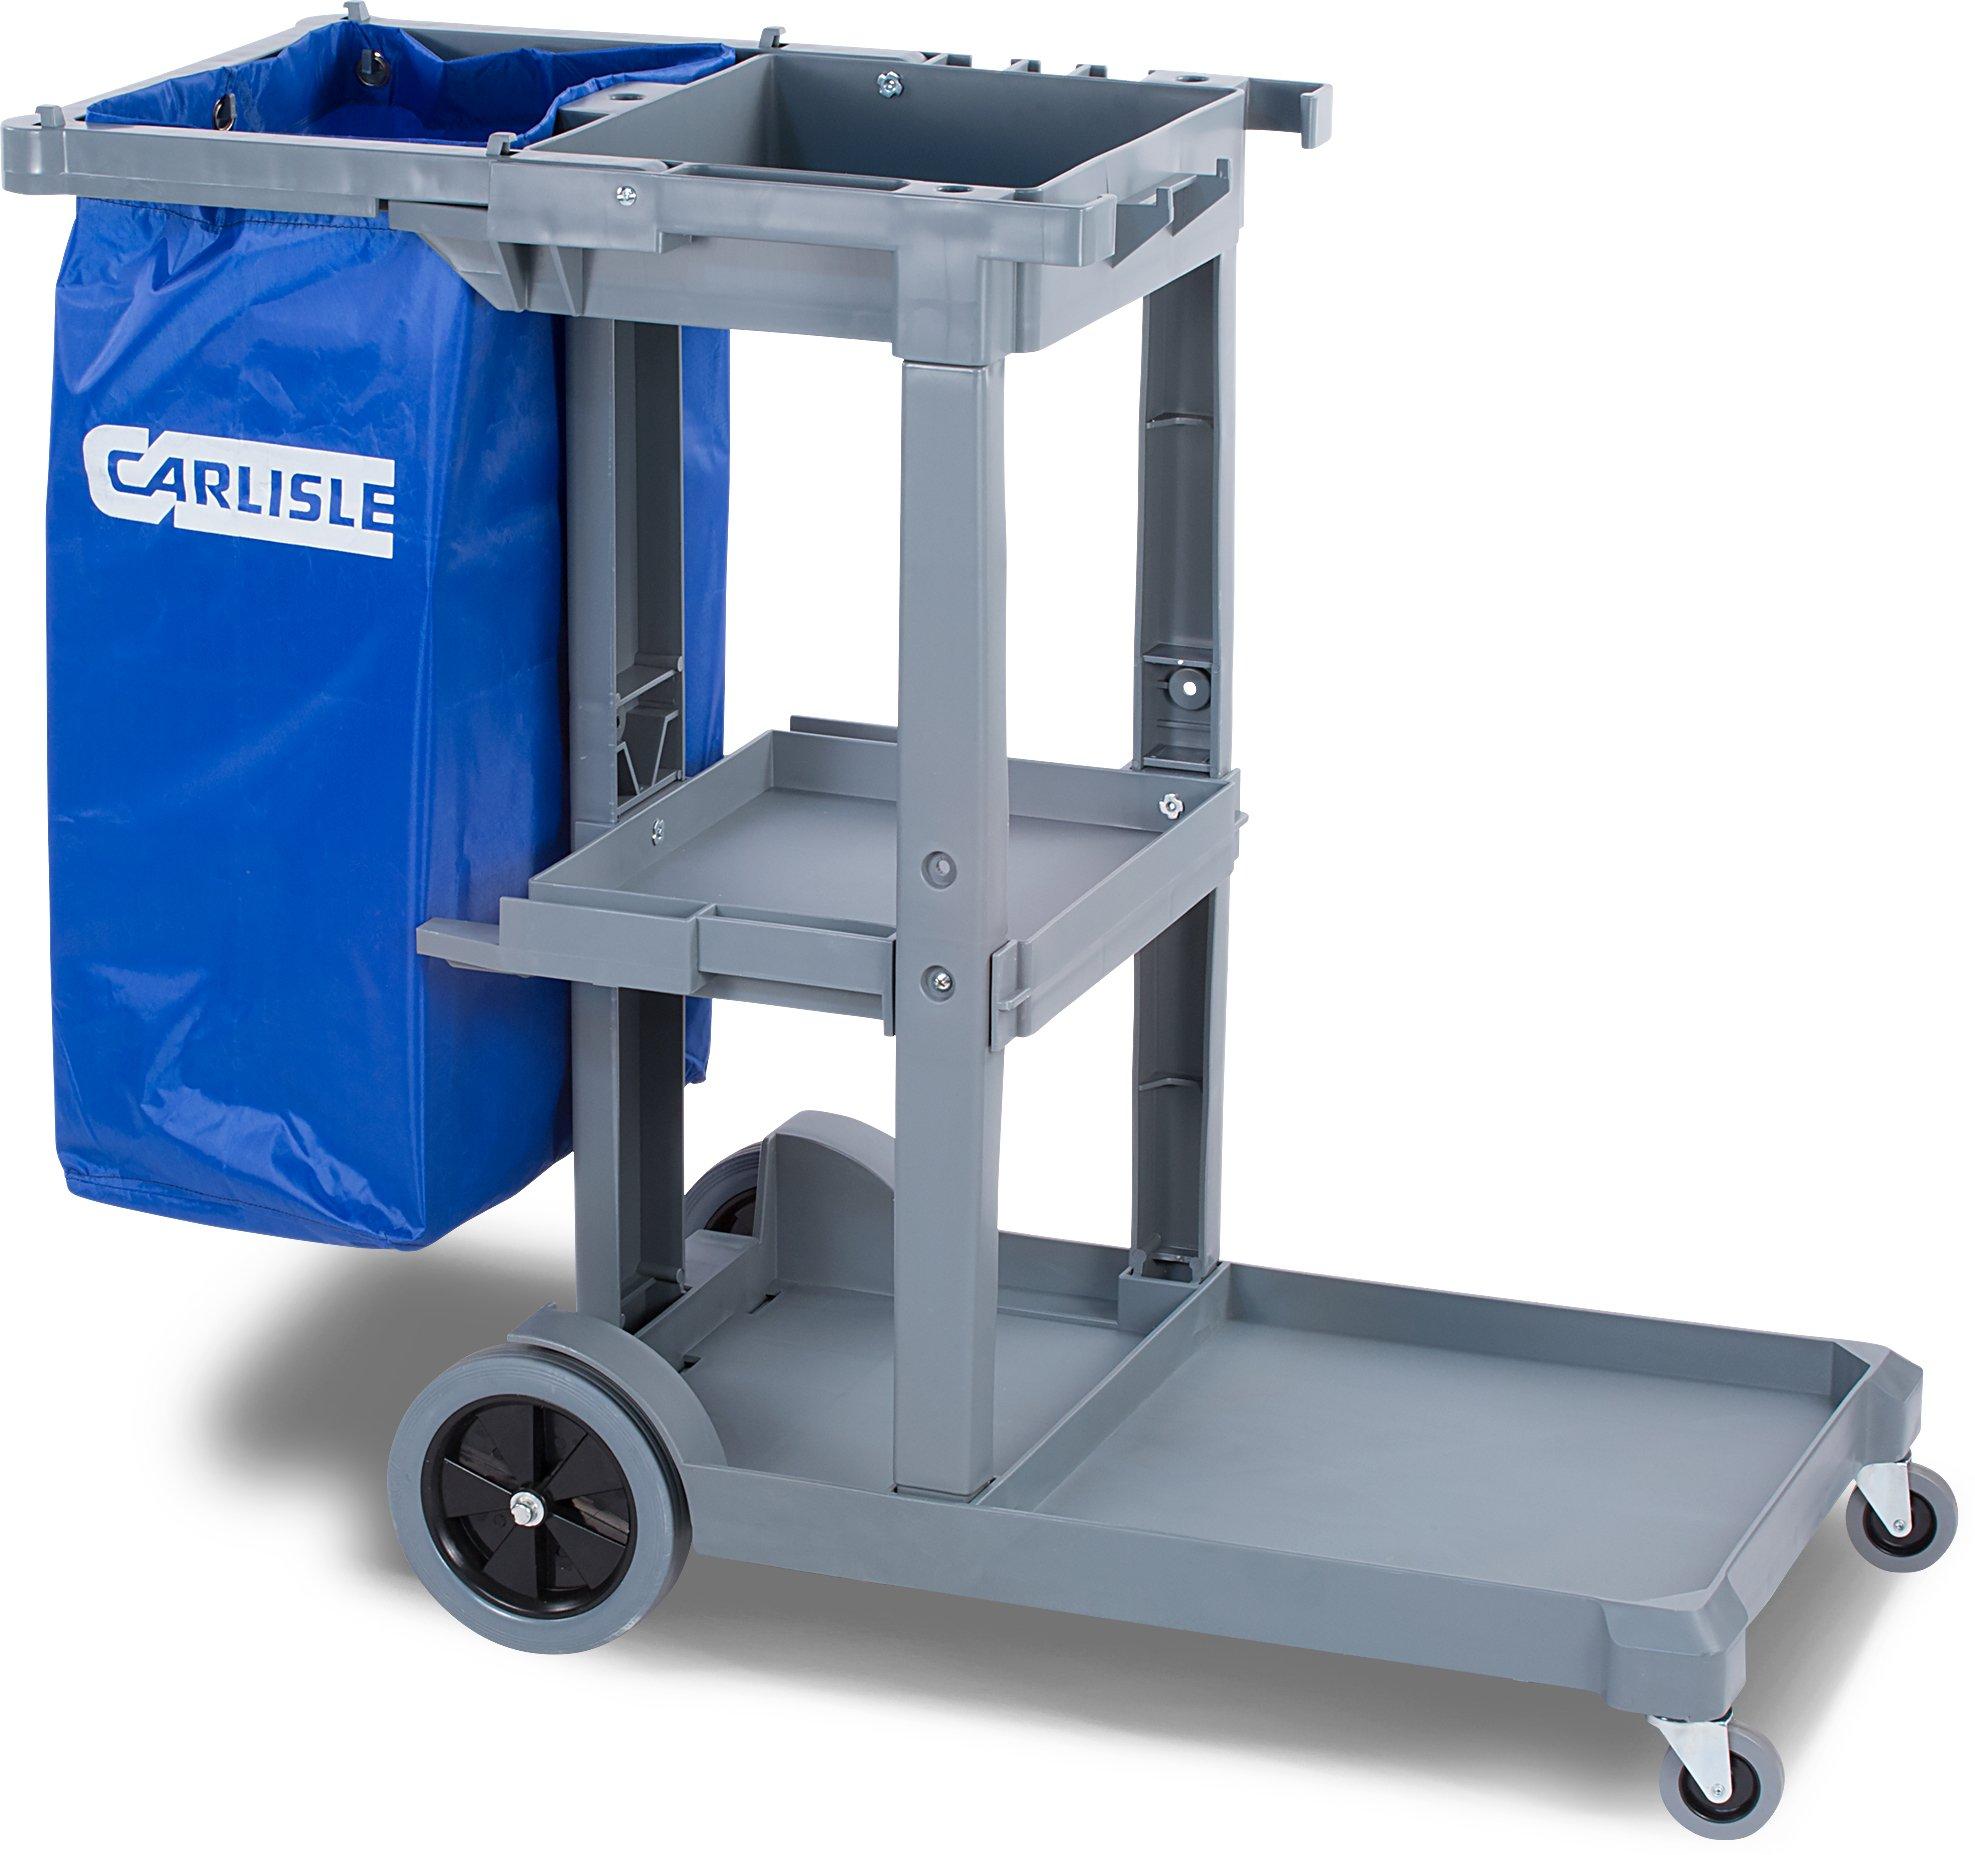 Carlisle JC1945S23 Polyethylene Short Platform Janitorial Cart, 300 lbs Capacity, 45'' Length x 19'' Width 39'' Height, Gray